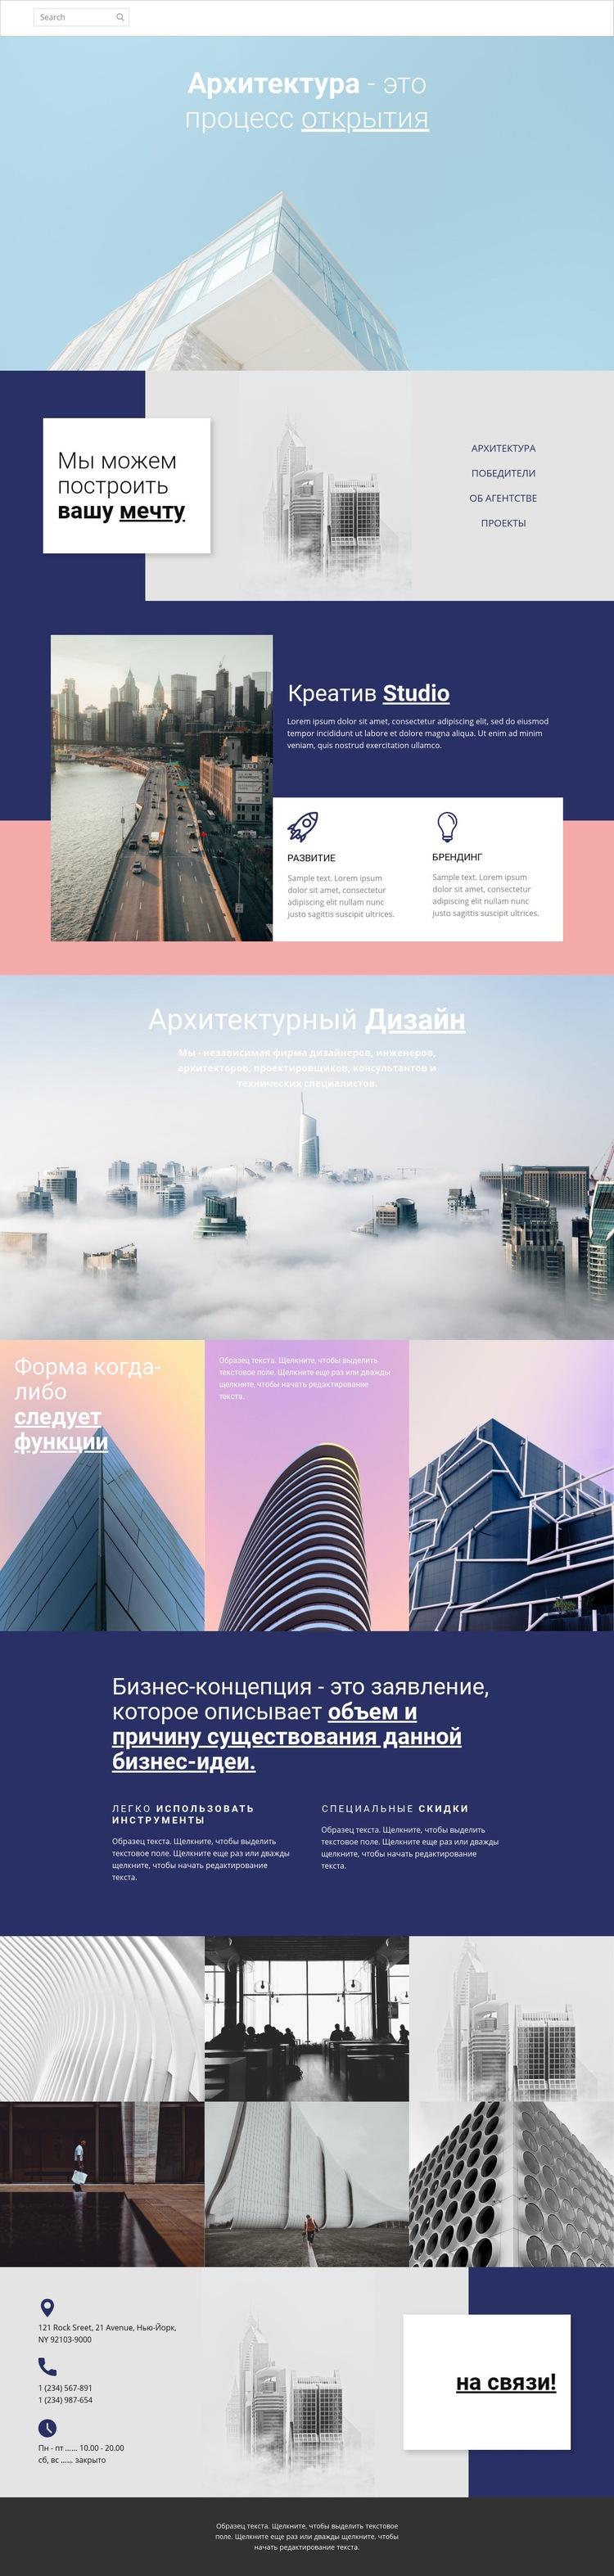 Чудеса архитектуры Шаблон веб-сайта